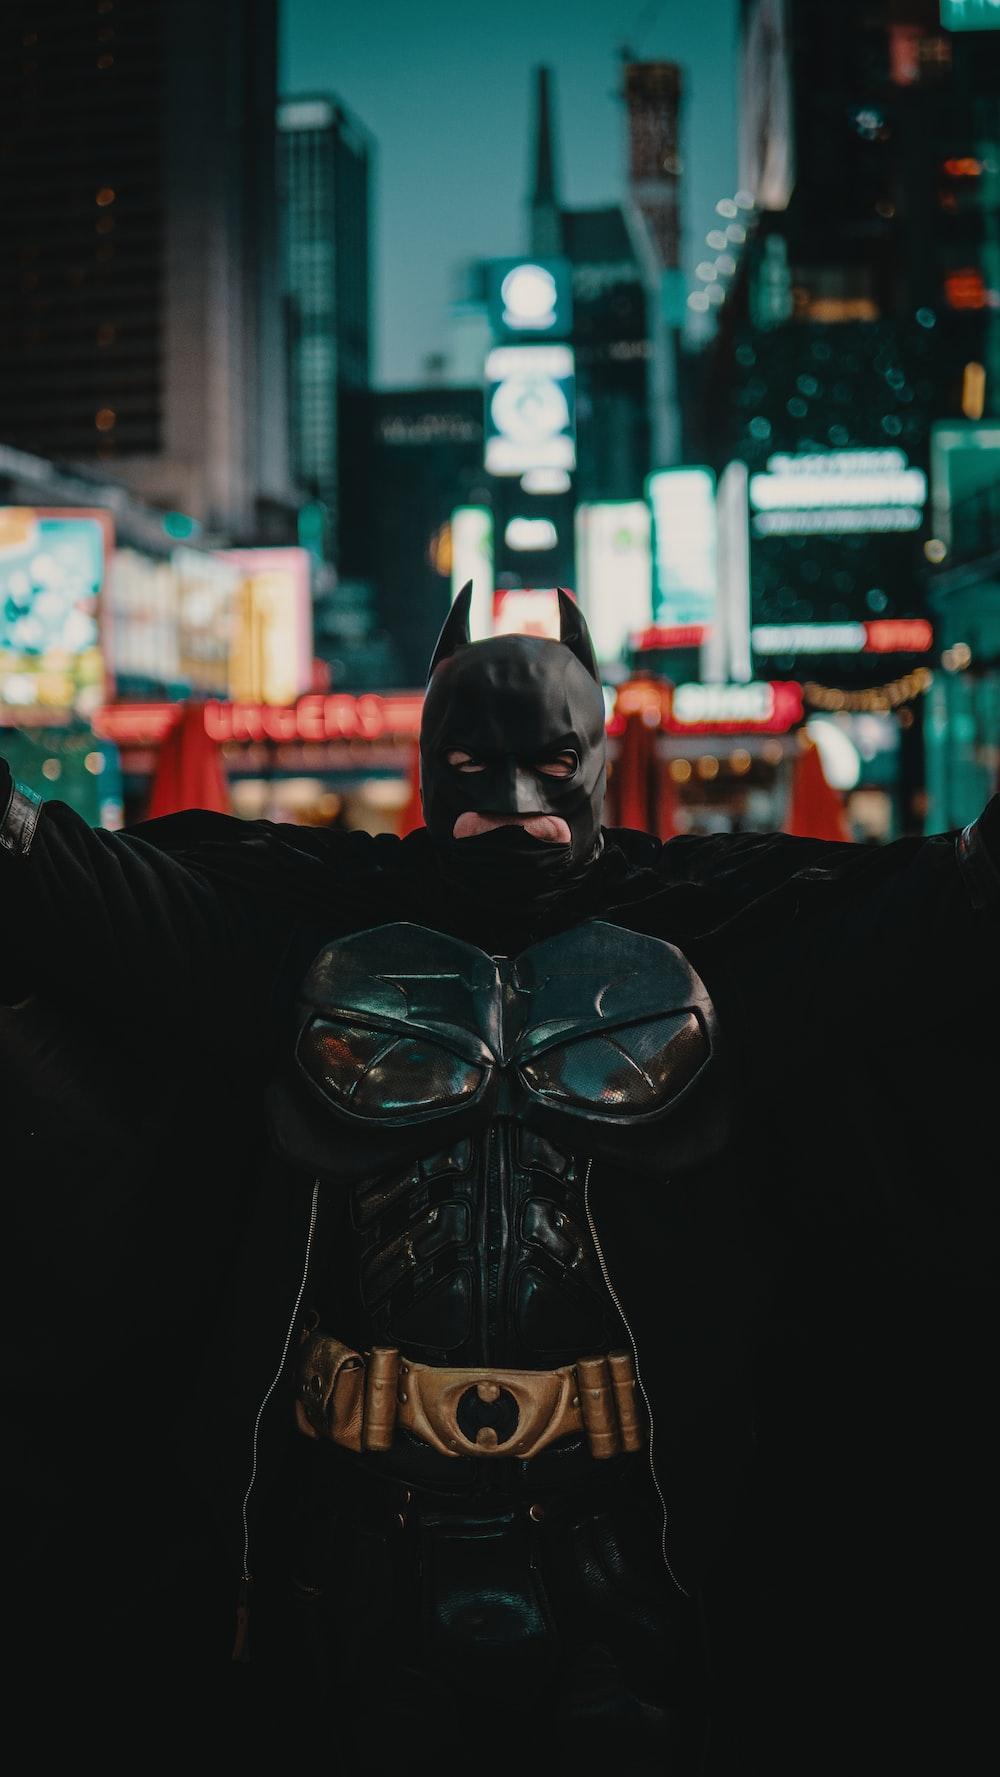 man wearing Batman costume